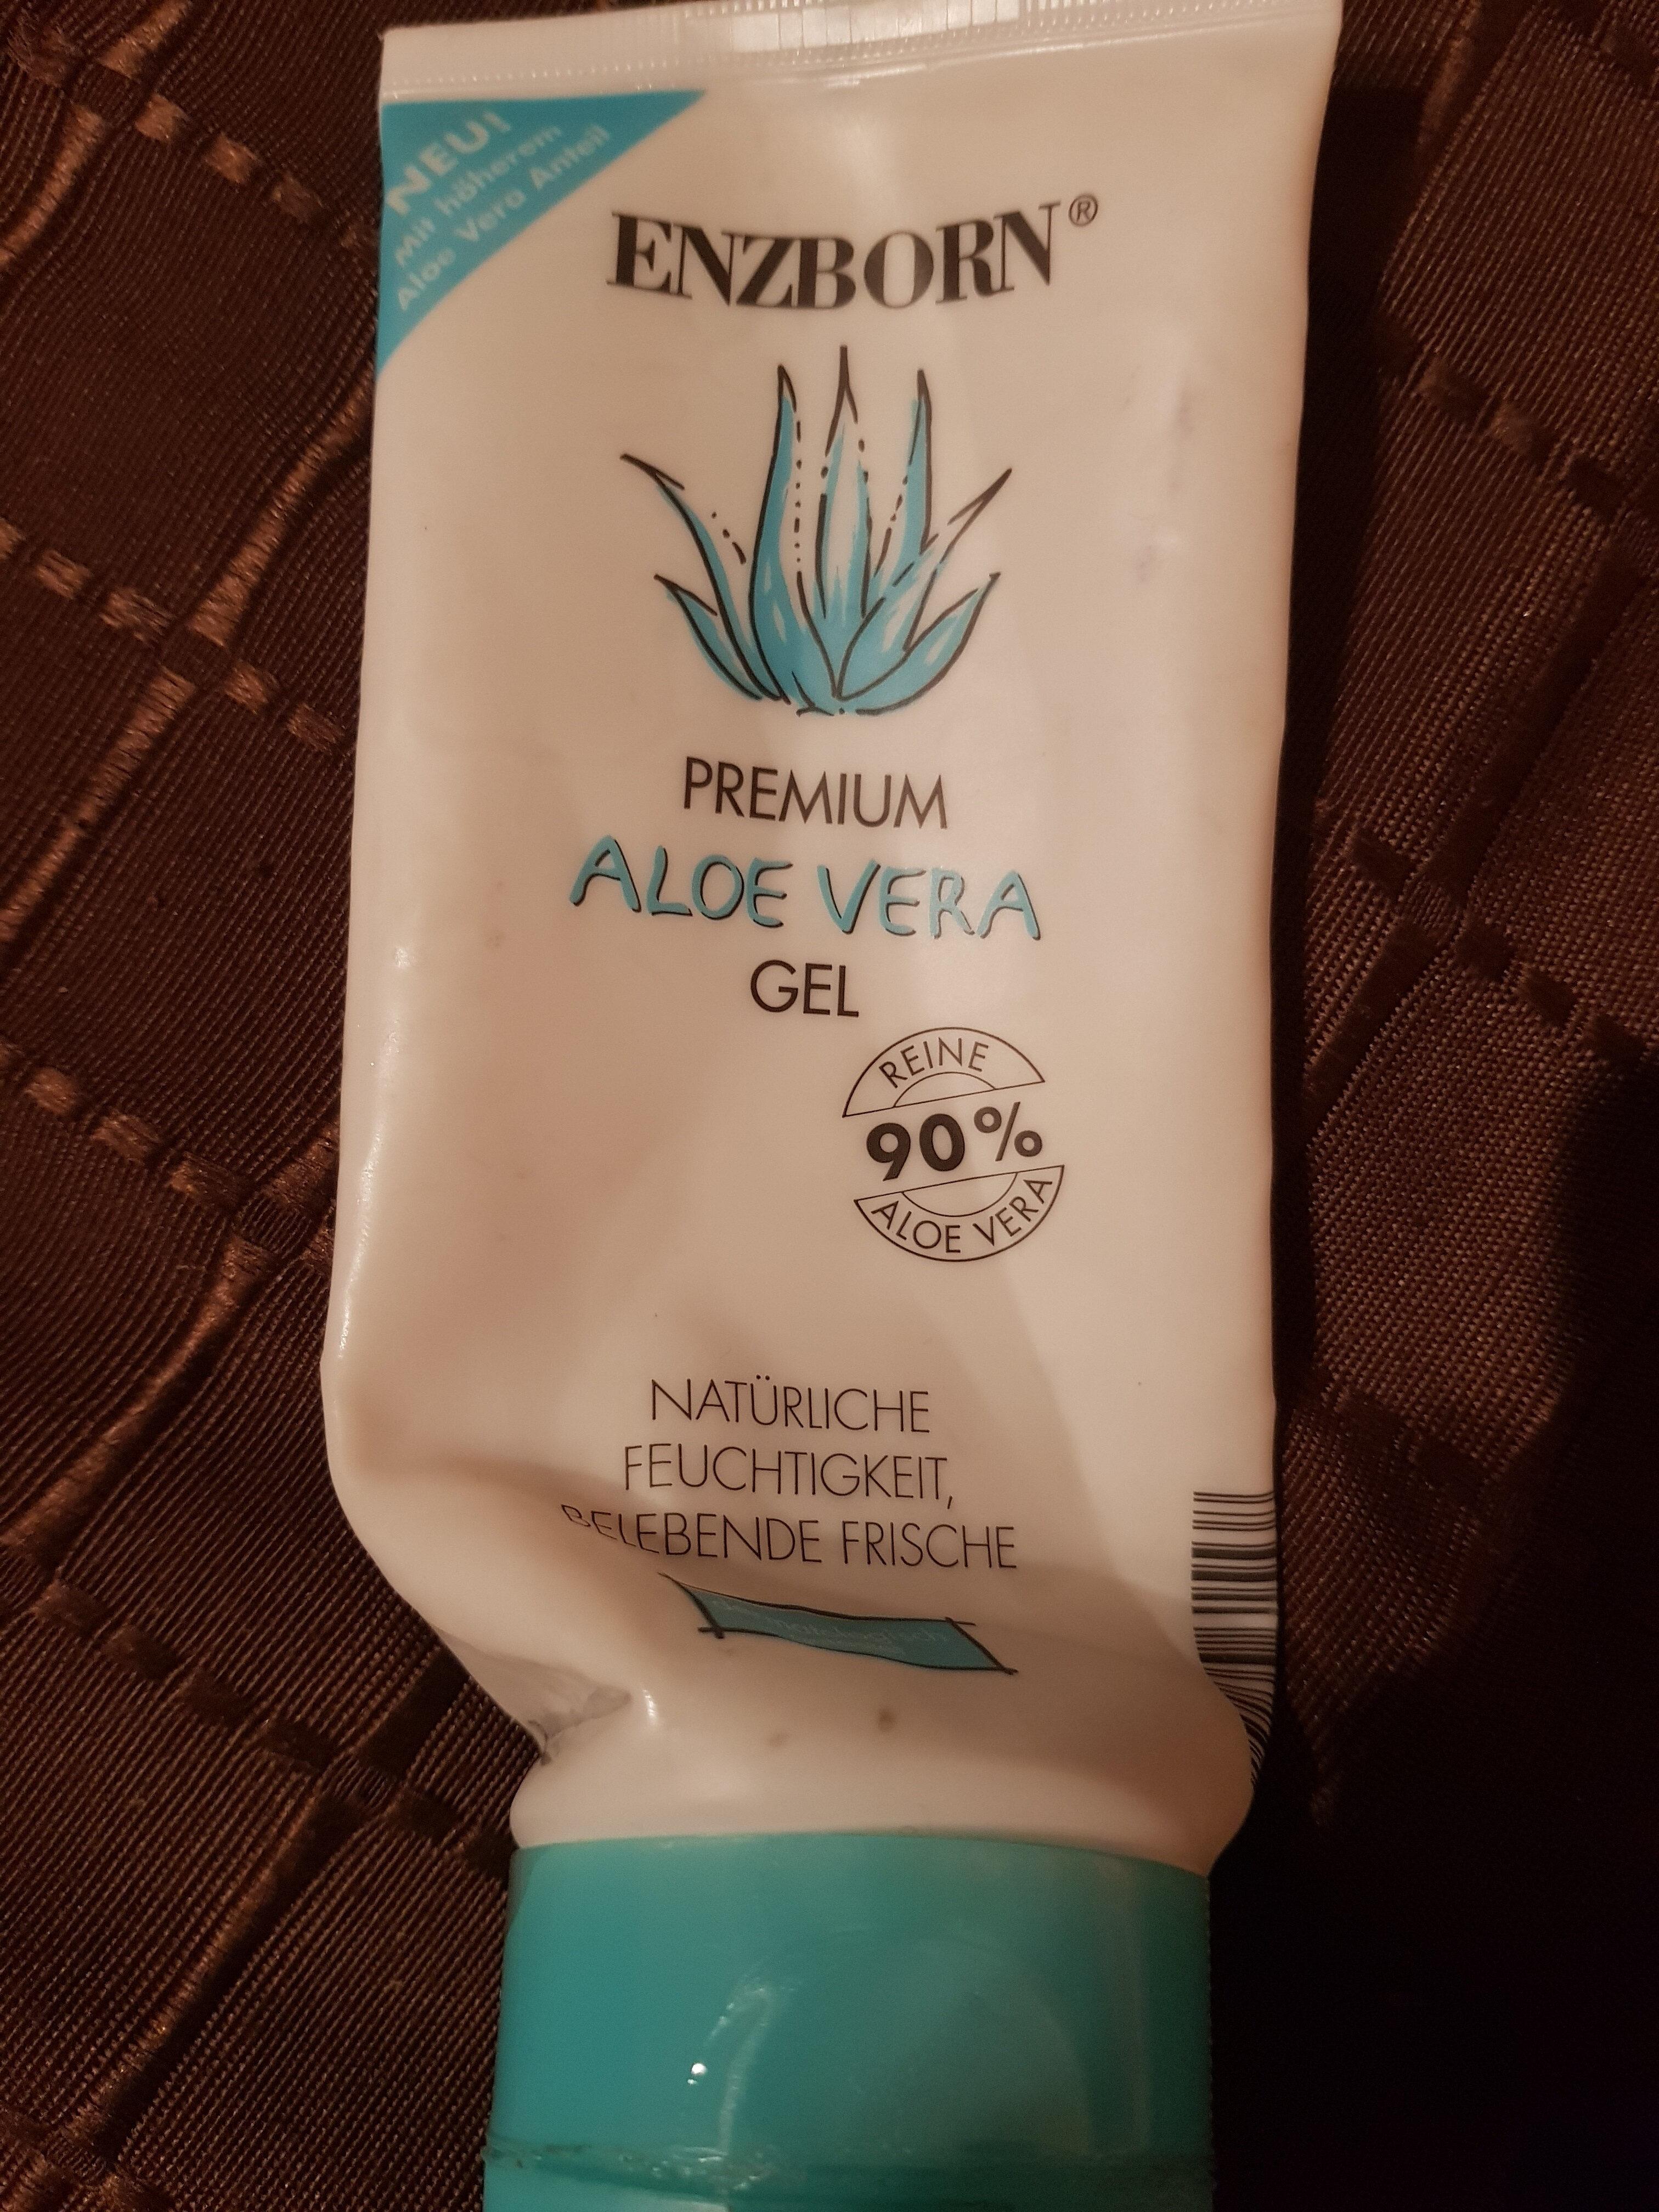 Enzborn Premium Aloe Vera Gel 90% - Product - de